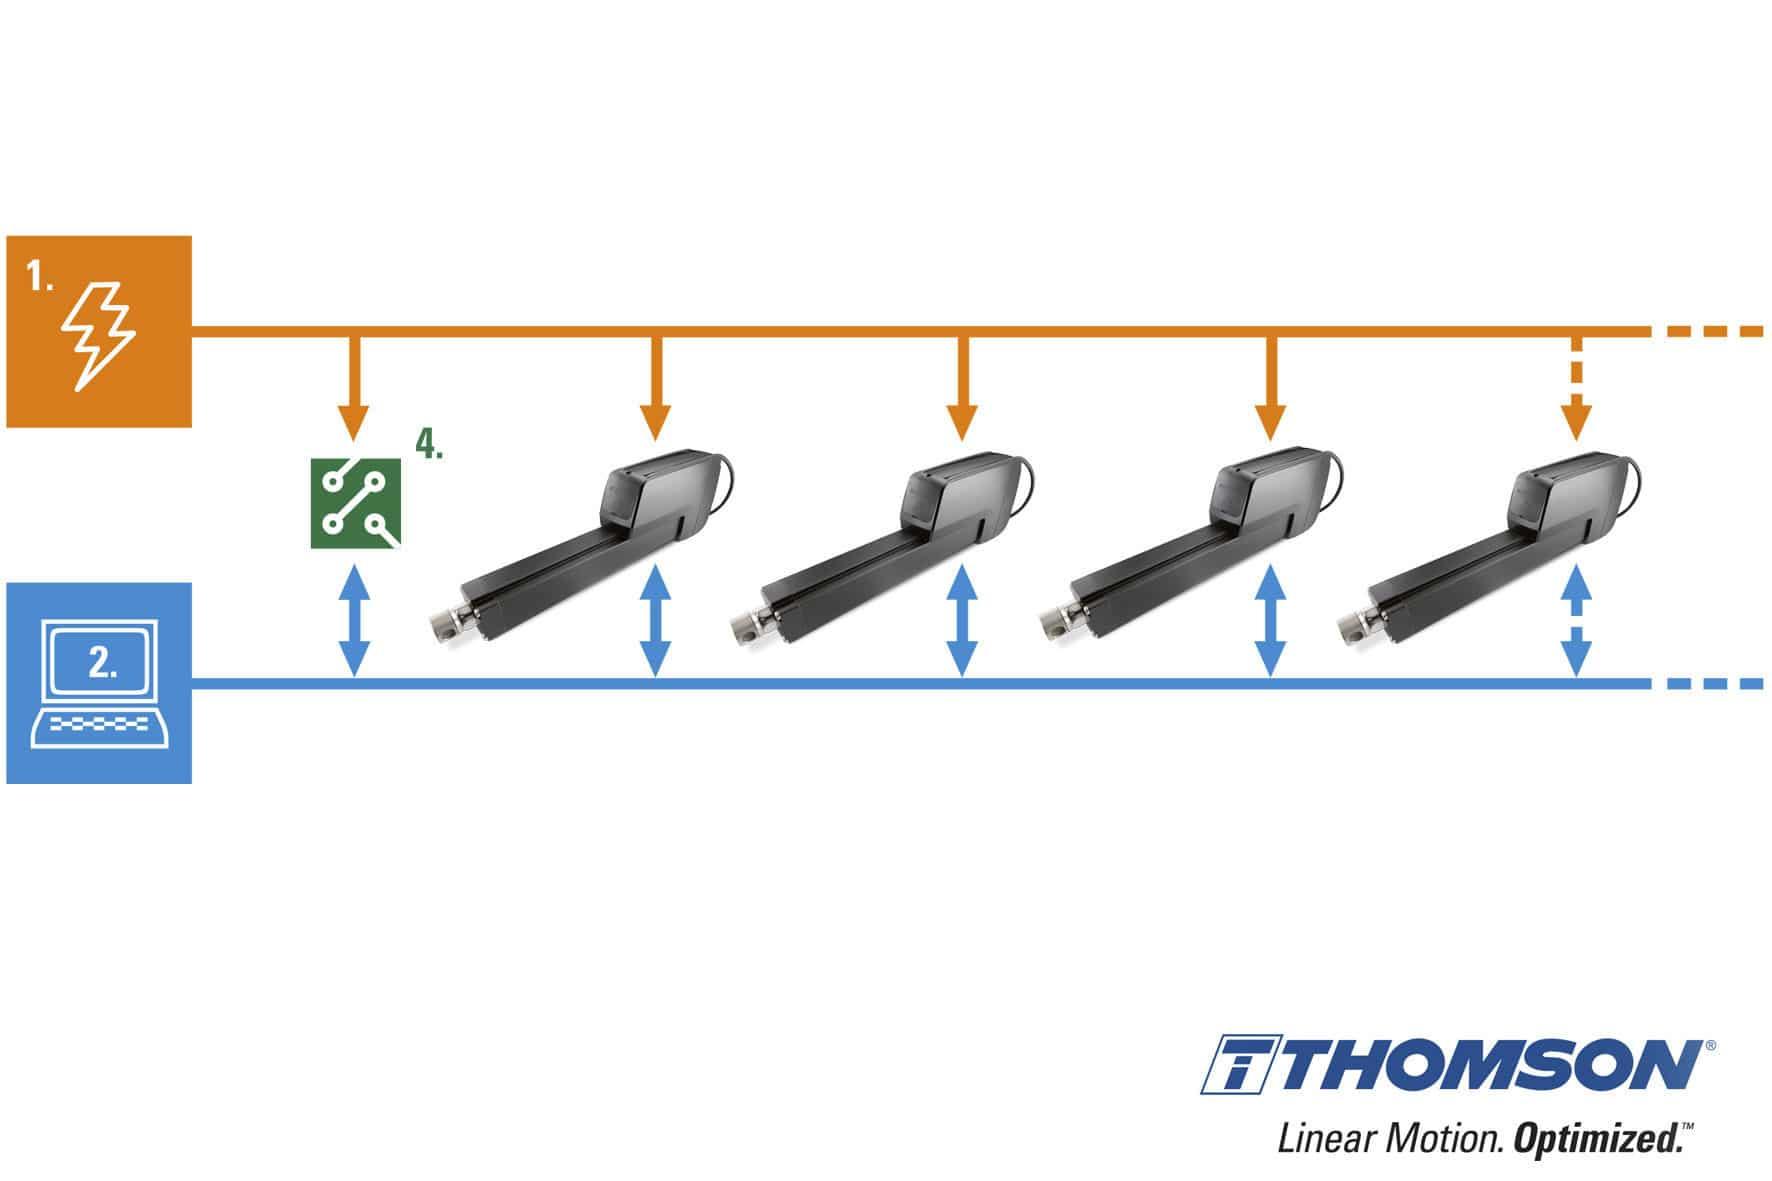 7040 10336266 linear slide actuator wiring diagram roslonek net,Slide Wiring Diagram